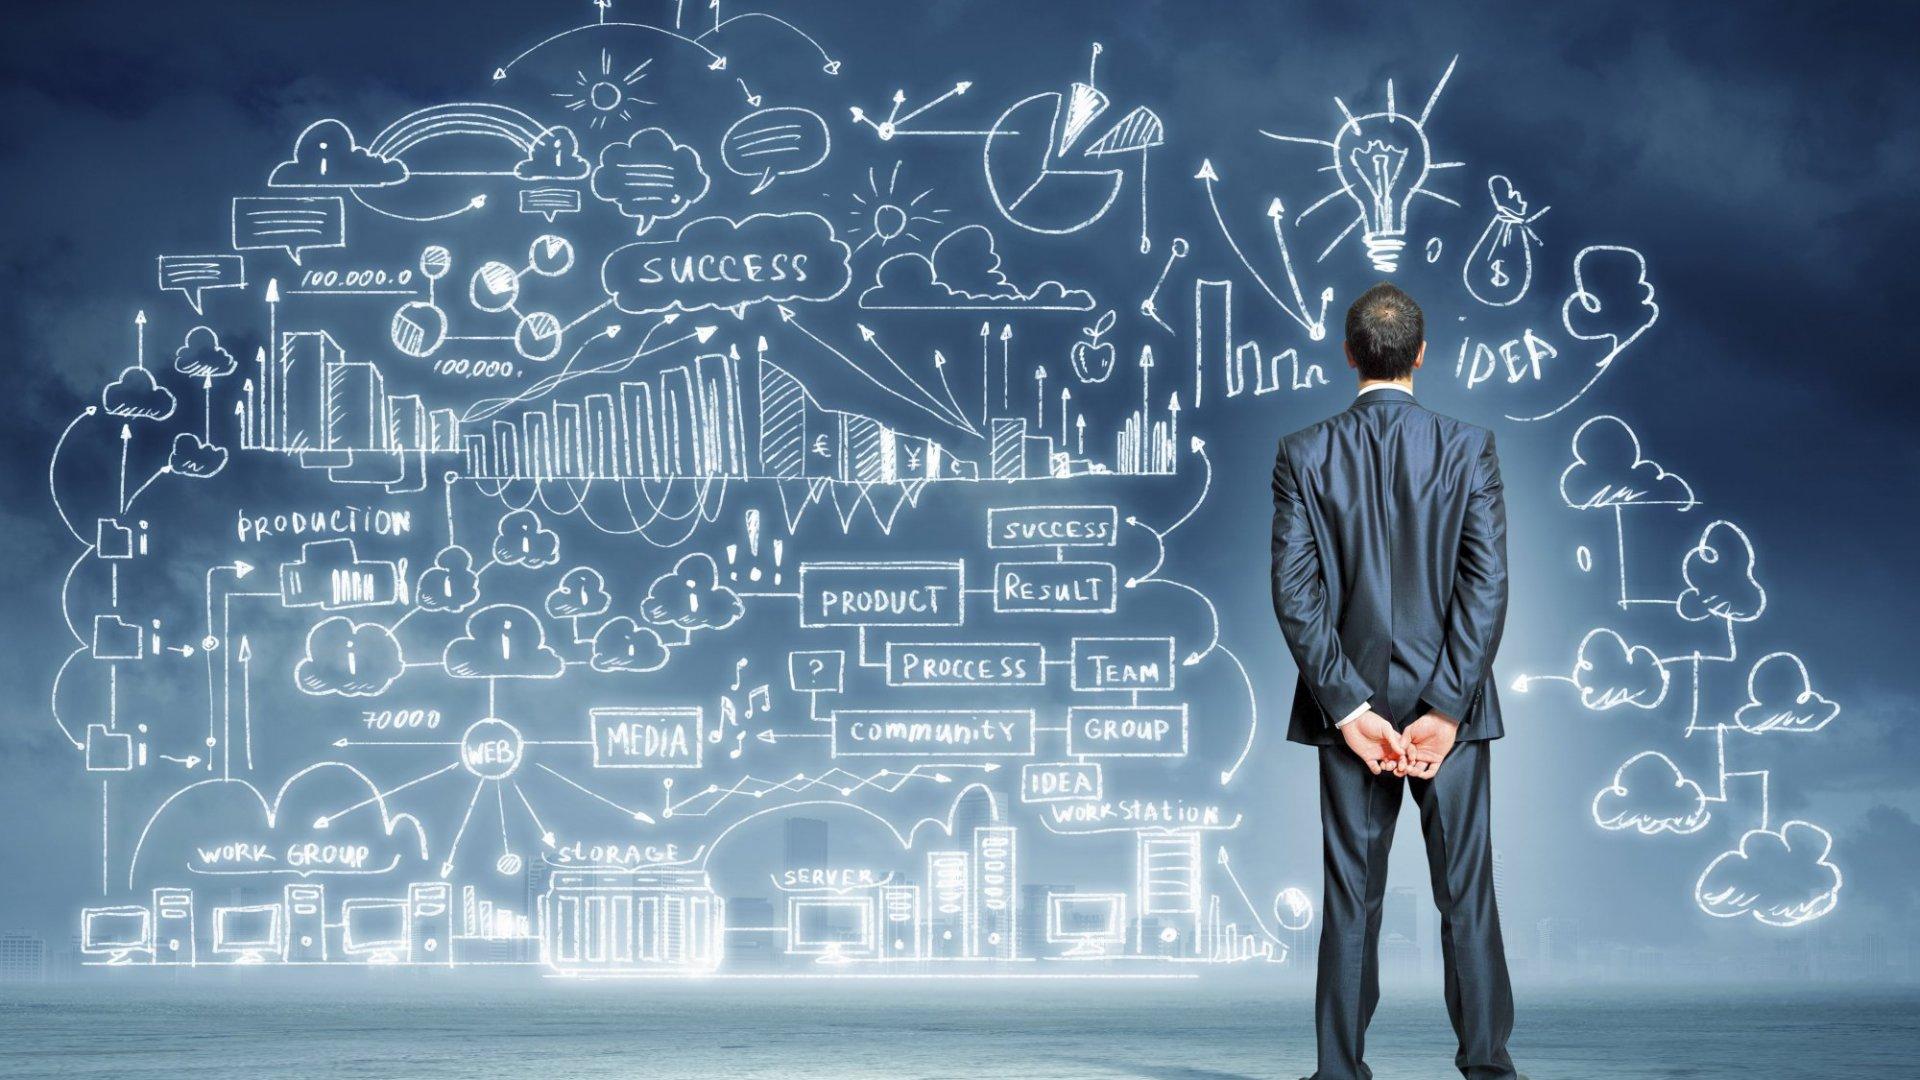 The Top 10 Business Schools of 2015